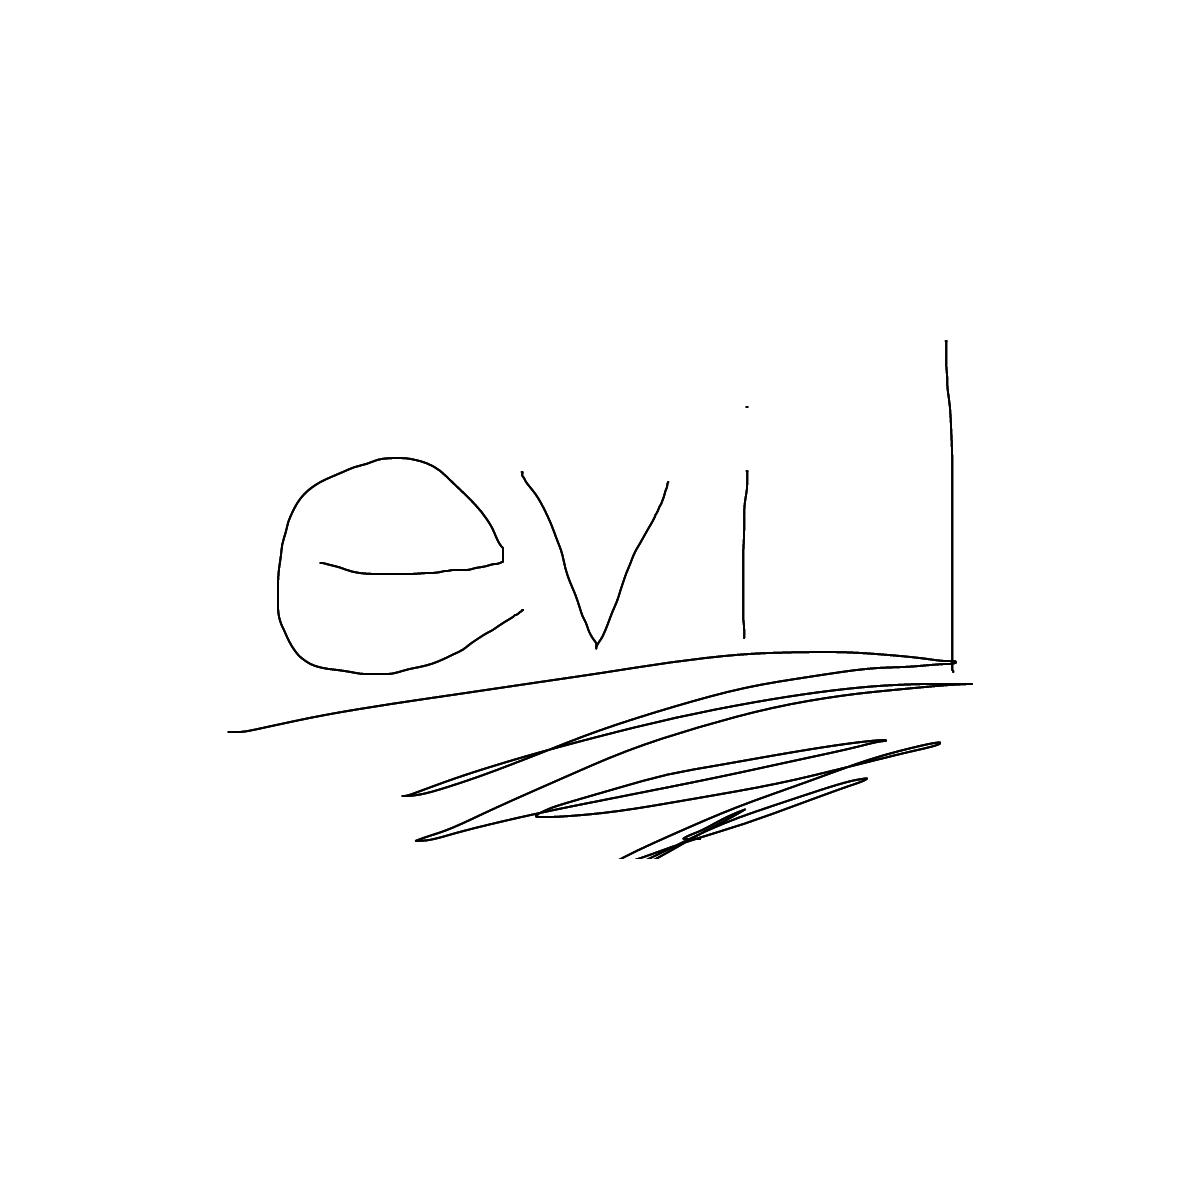 BAAAM drawing#1840 lat:43.6661224365234400lng: -79.3930969238281200